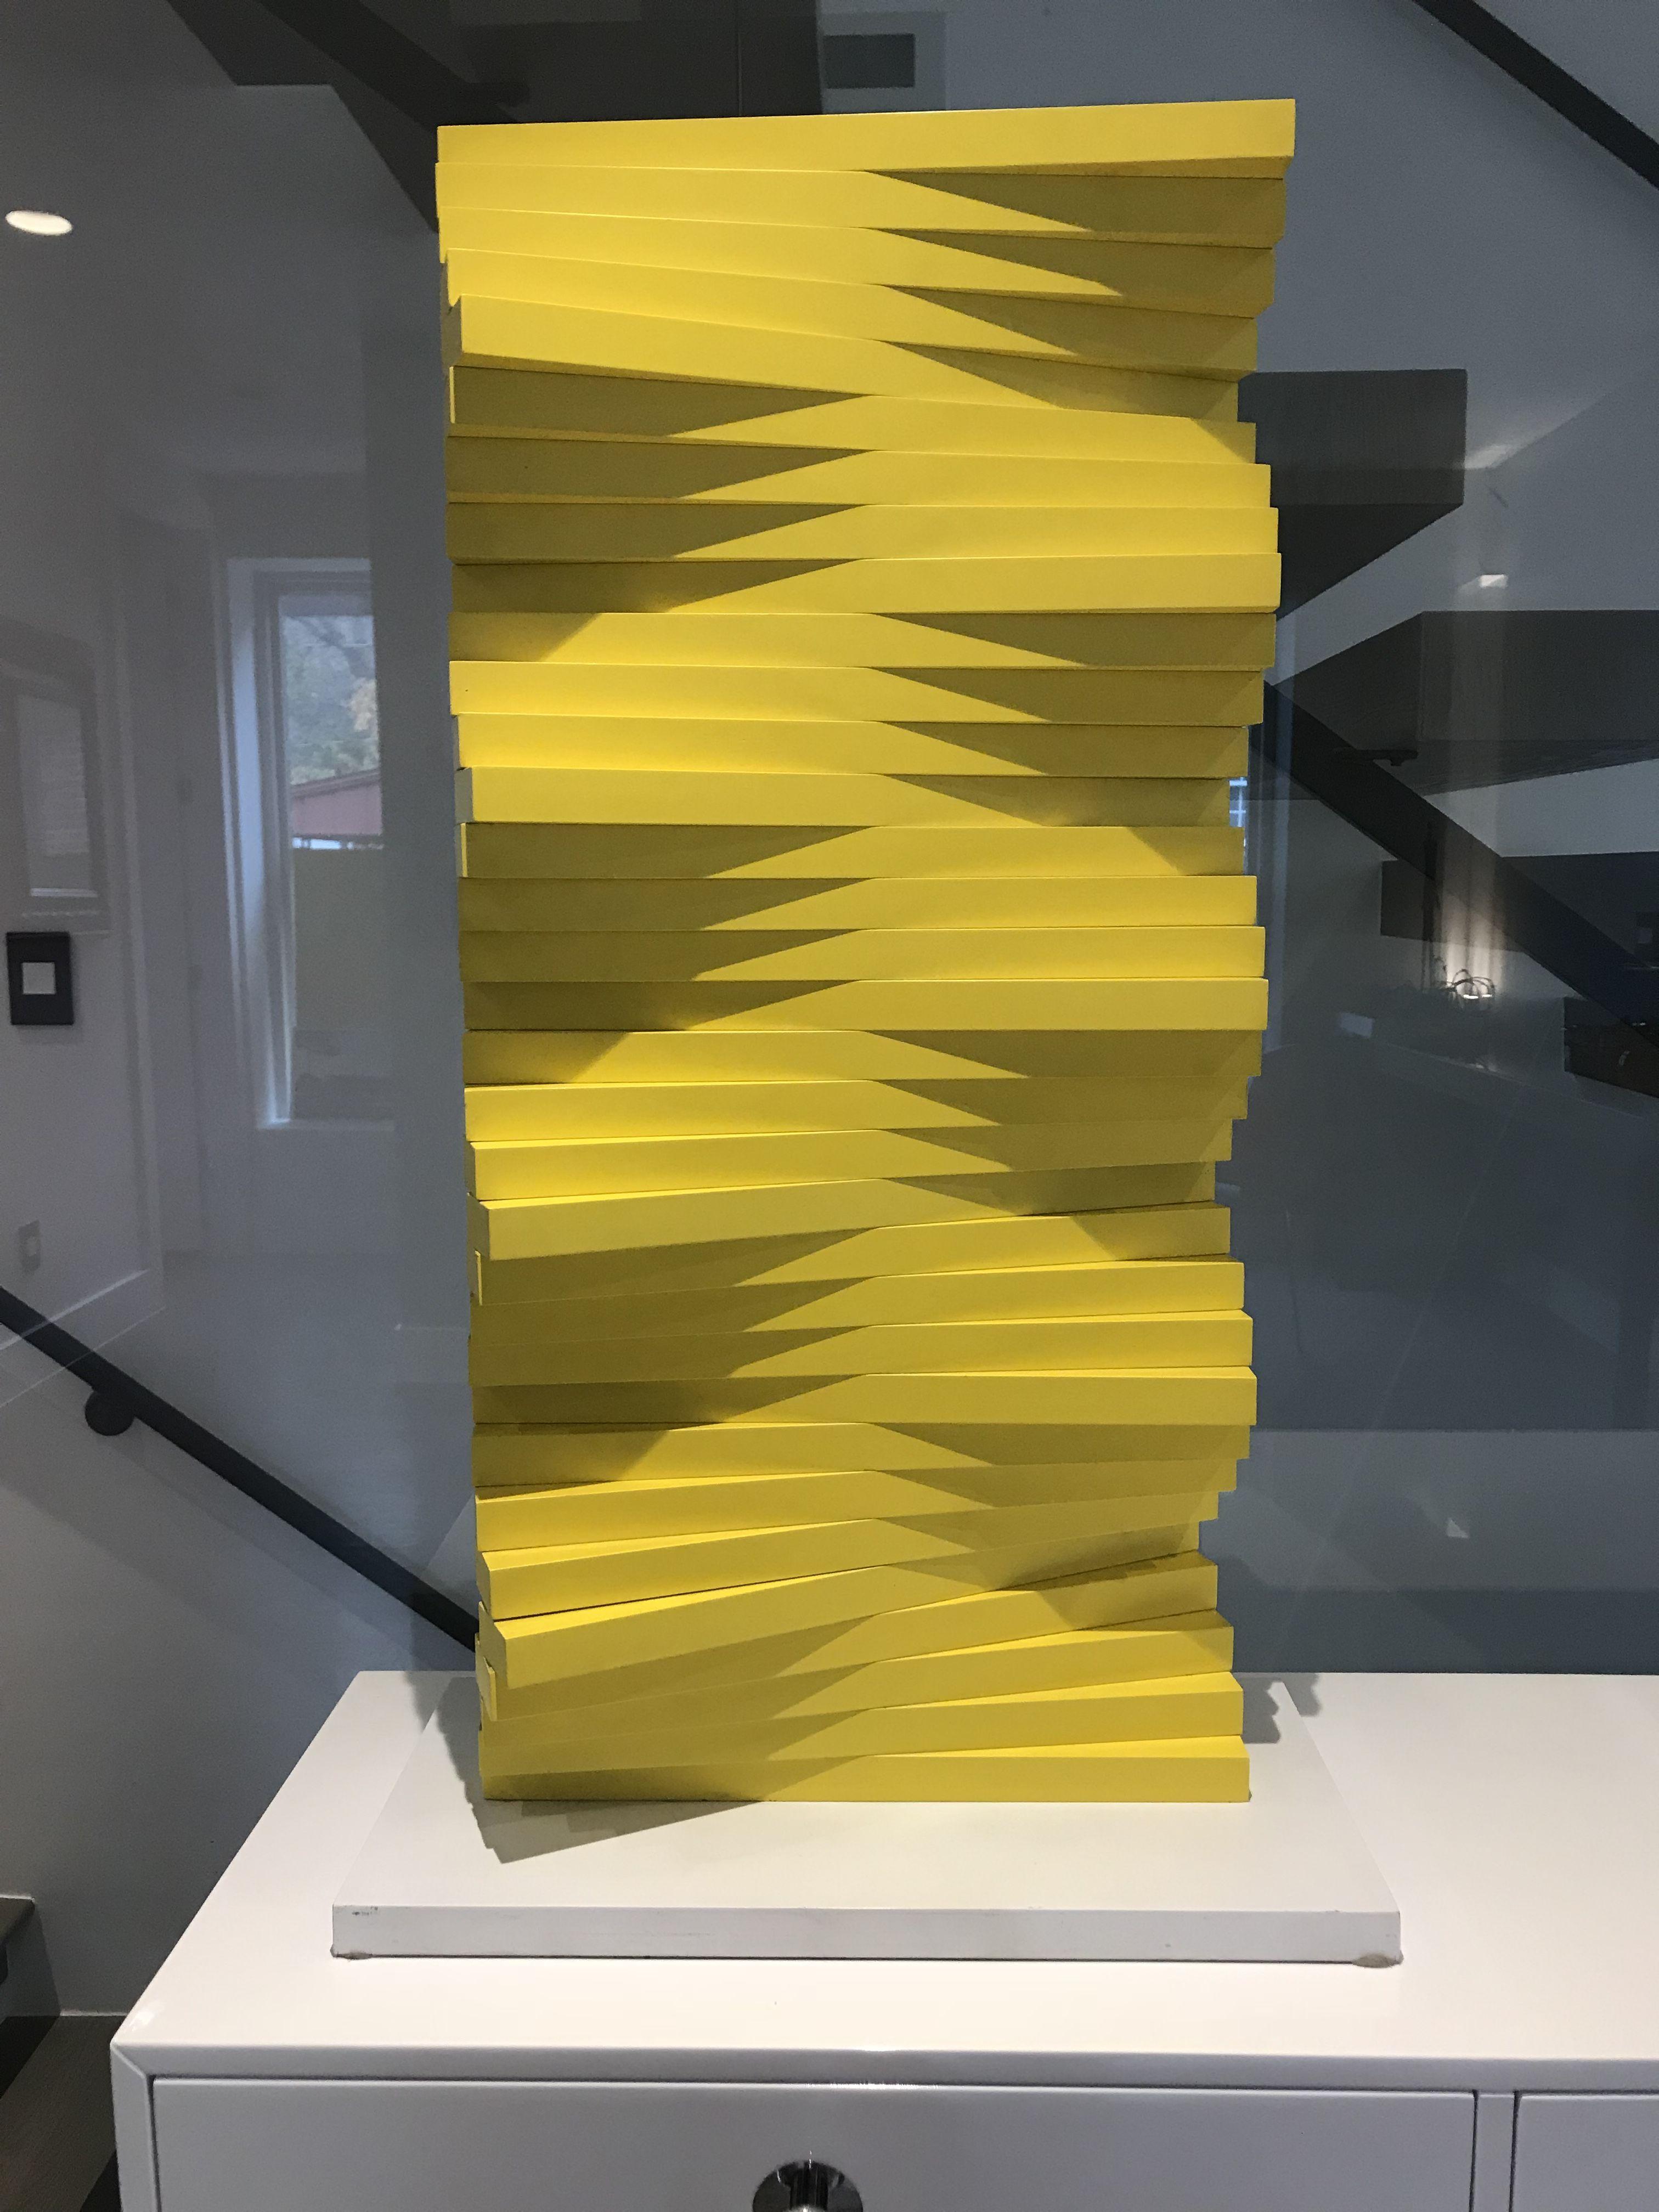 Authentic Herbert Bayer Tabletop Sculpture Denver CO Articulated ...